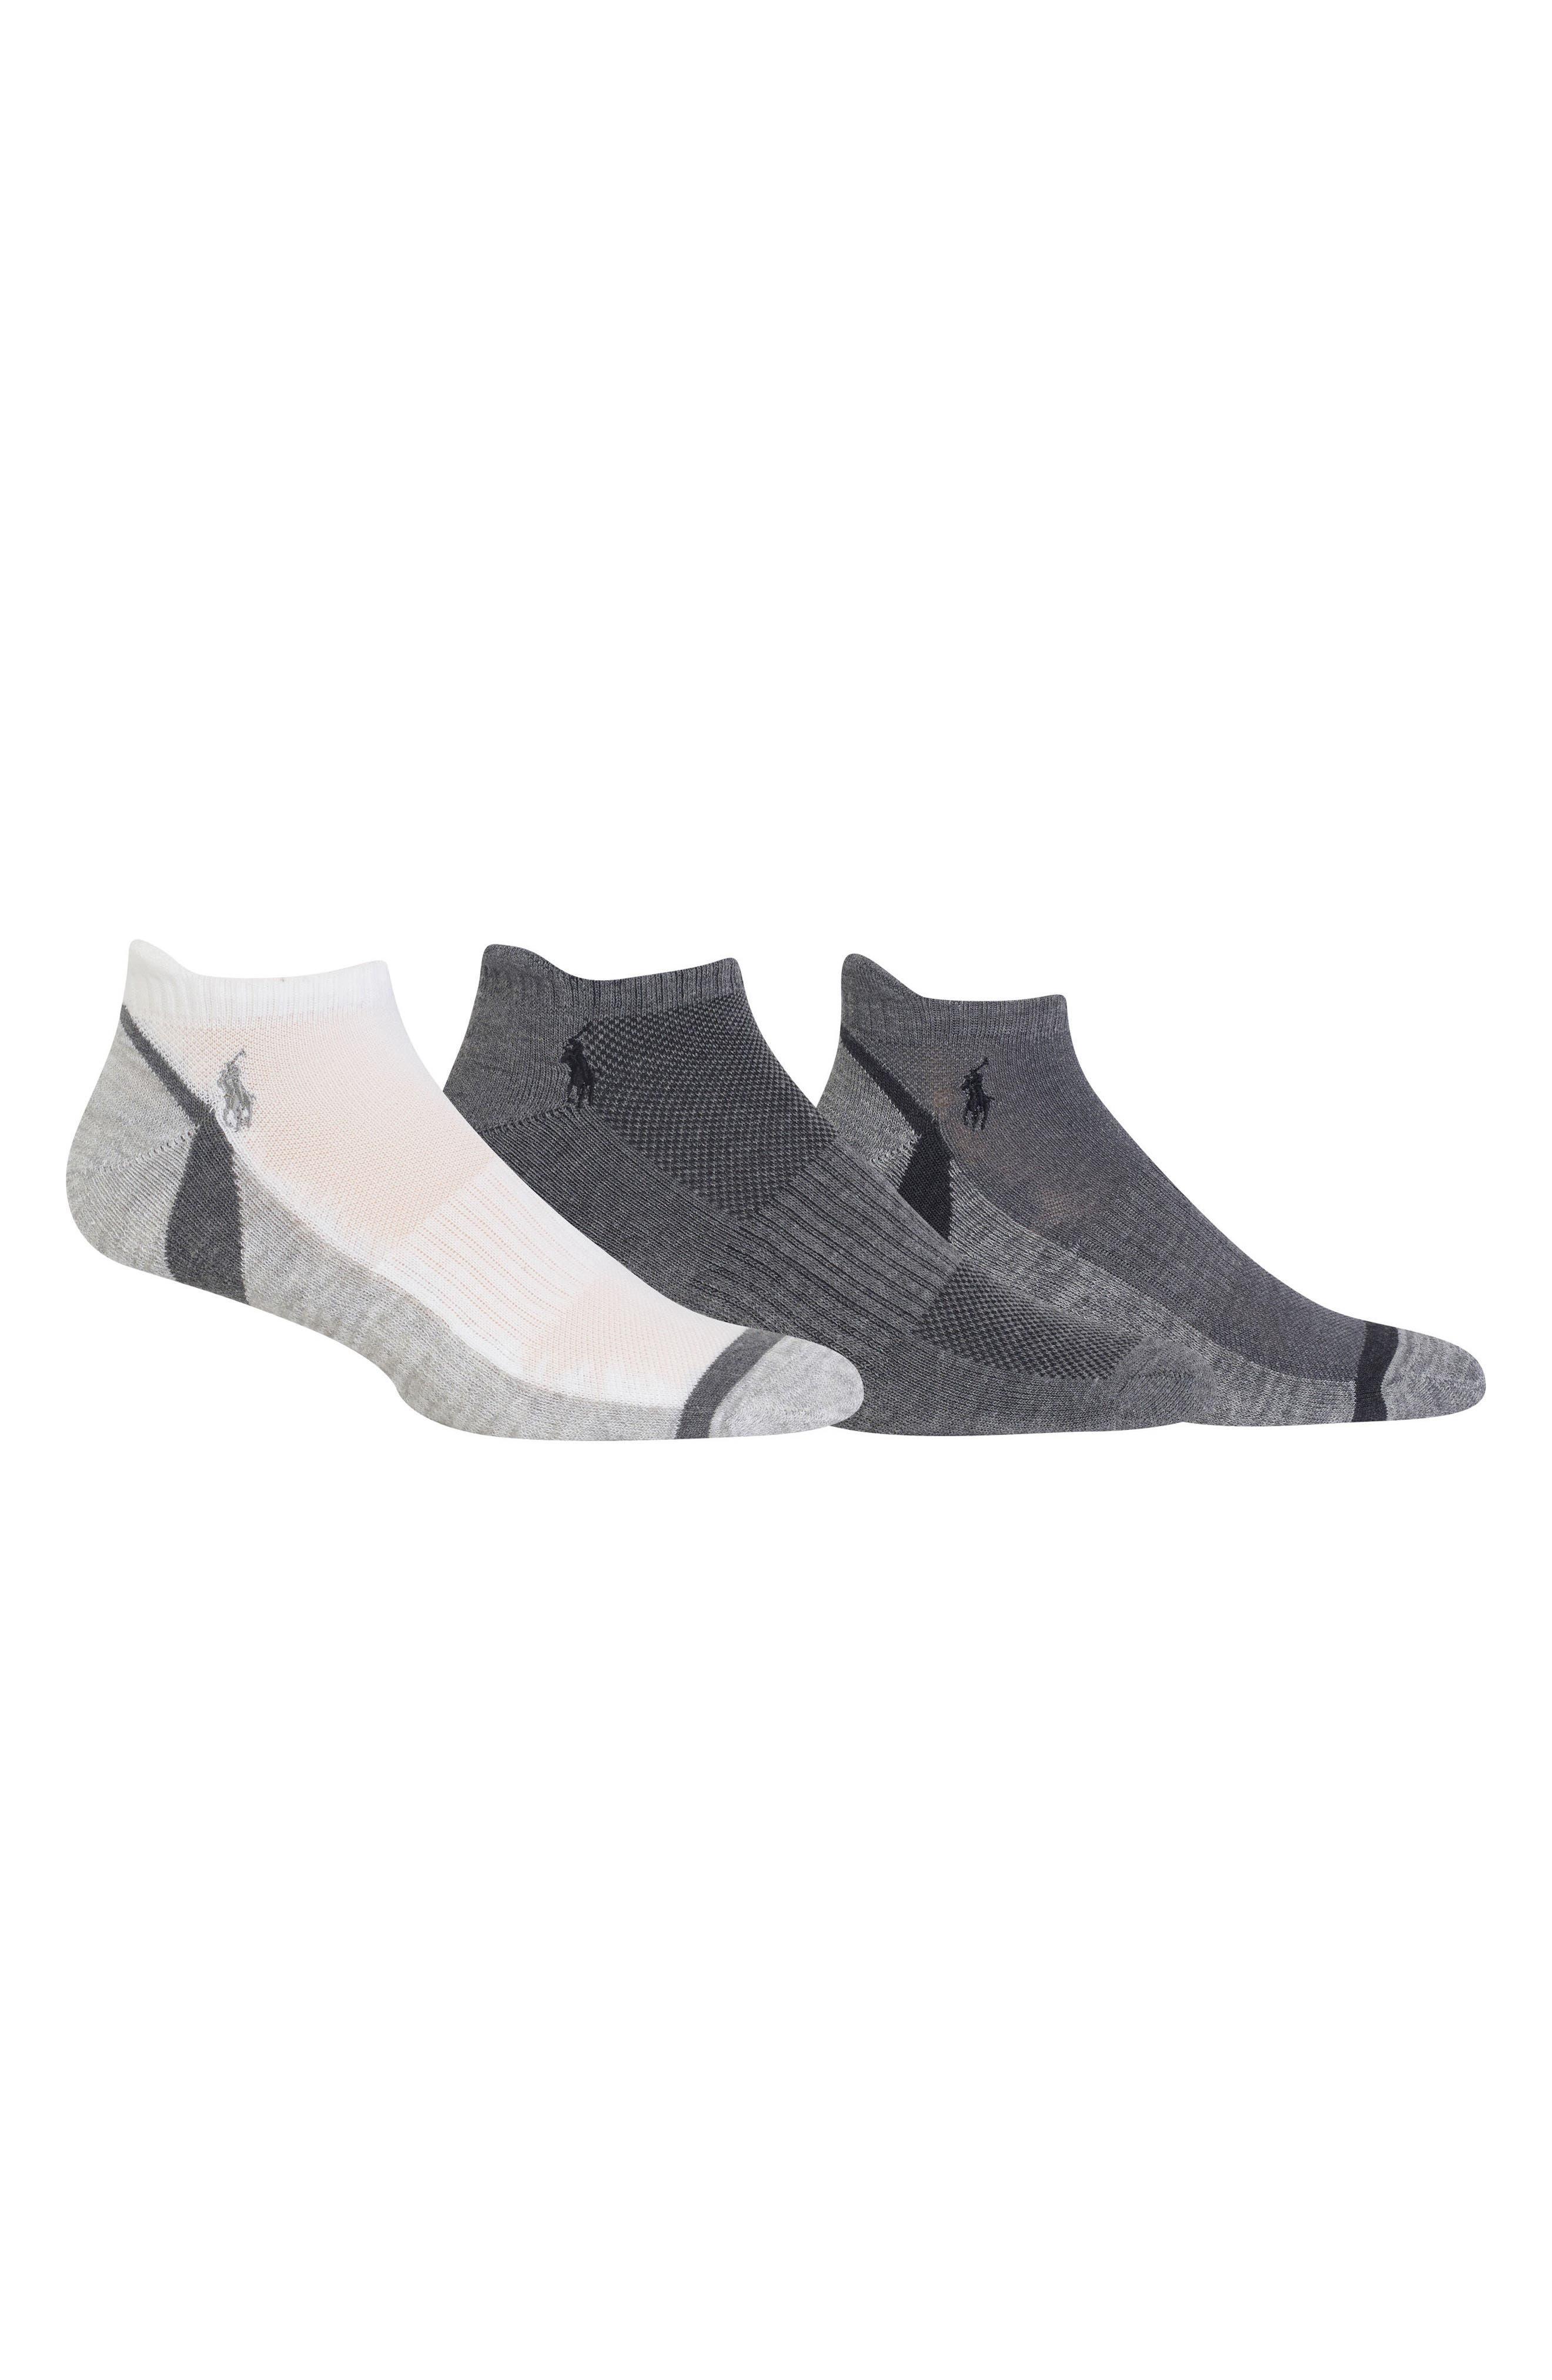 Polo Ralph Lauren 3-Pack Ankle Socks,                             Main thumbnail 1, color,                             Grey Multi